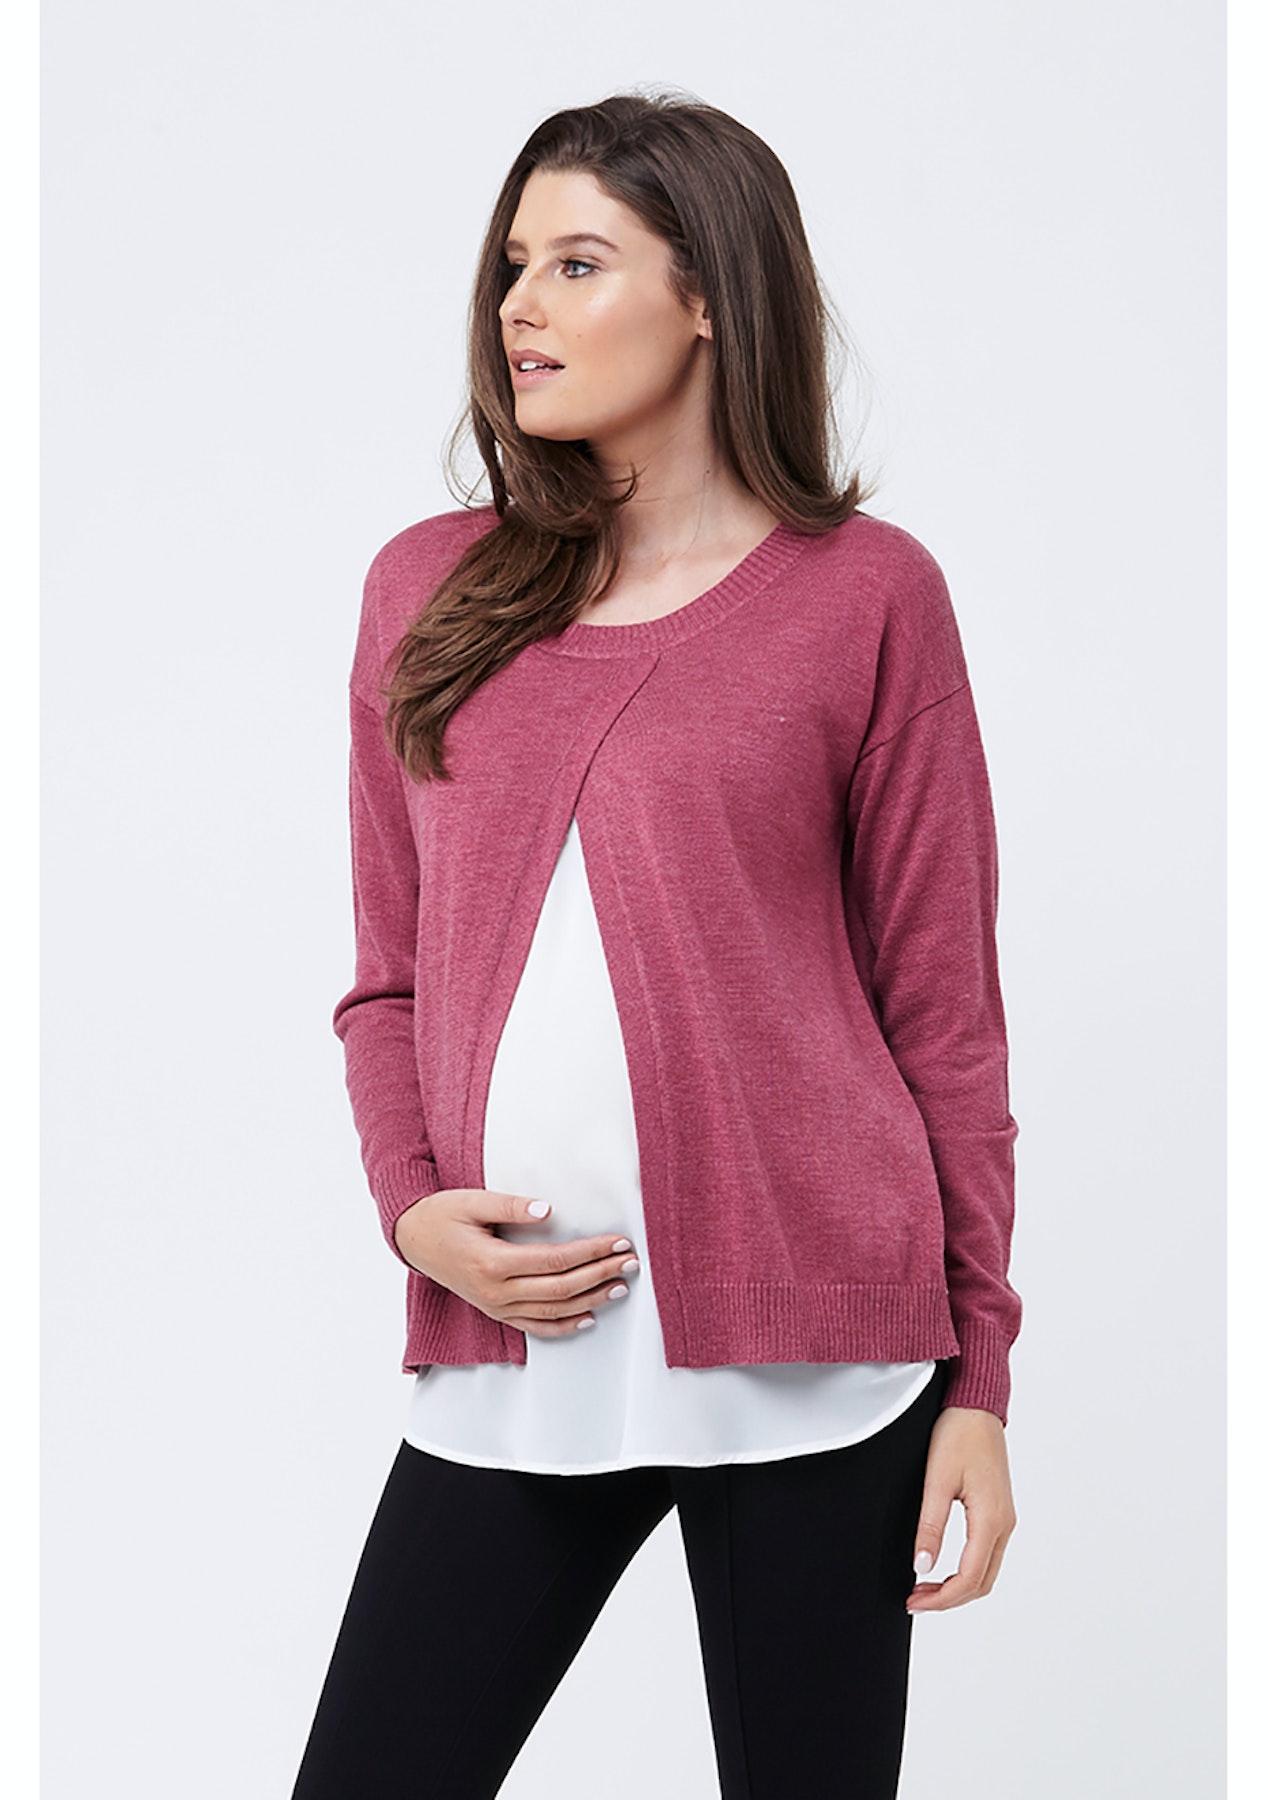 4fd645af47aff Ripe Maternity - Cross Front Nursing Sweater - RoseMilk - Ripe Maternity -  Onceit